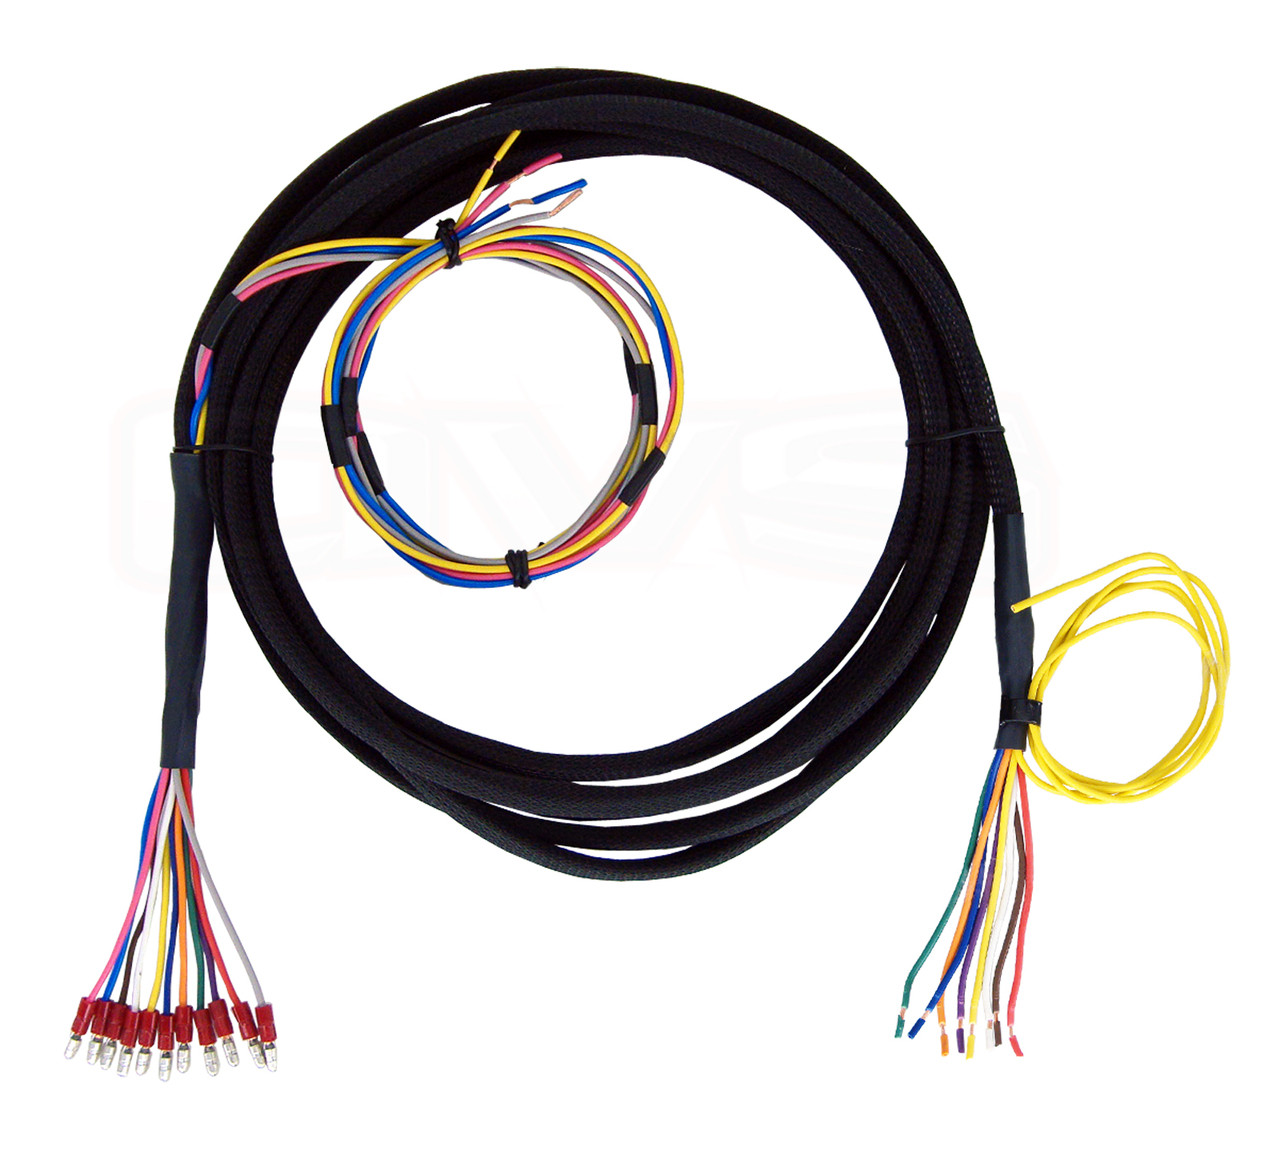 avs valve wiring harness 10 15 20 universal to avs 7 switch rh avsontheweb com 7 wire trailer wiring harness 4 plug wiring harness diagram [ 1280 x 1150 Pixel ]